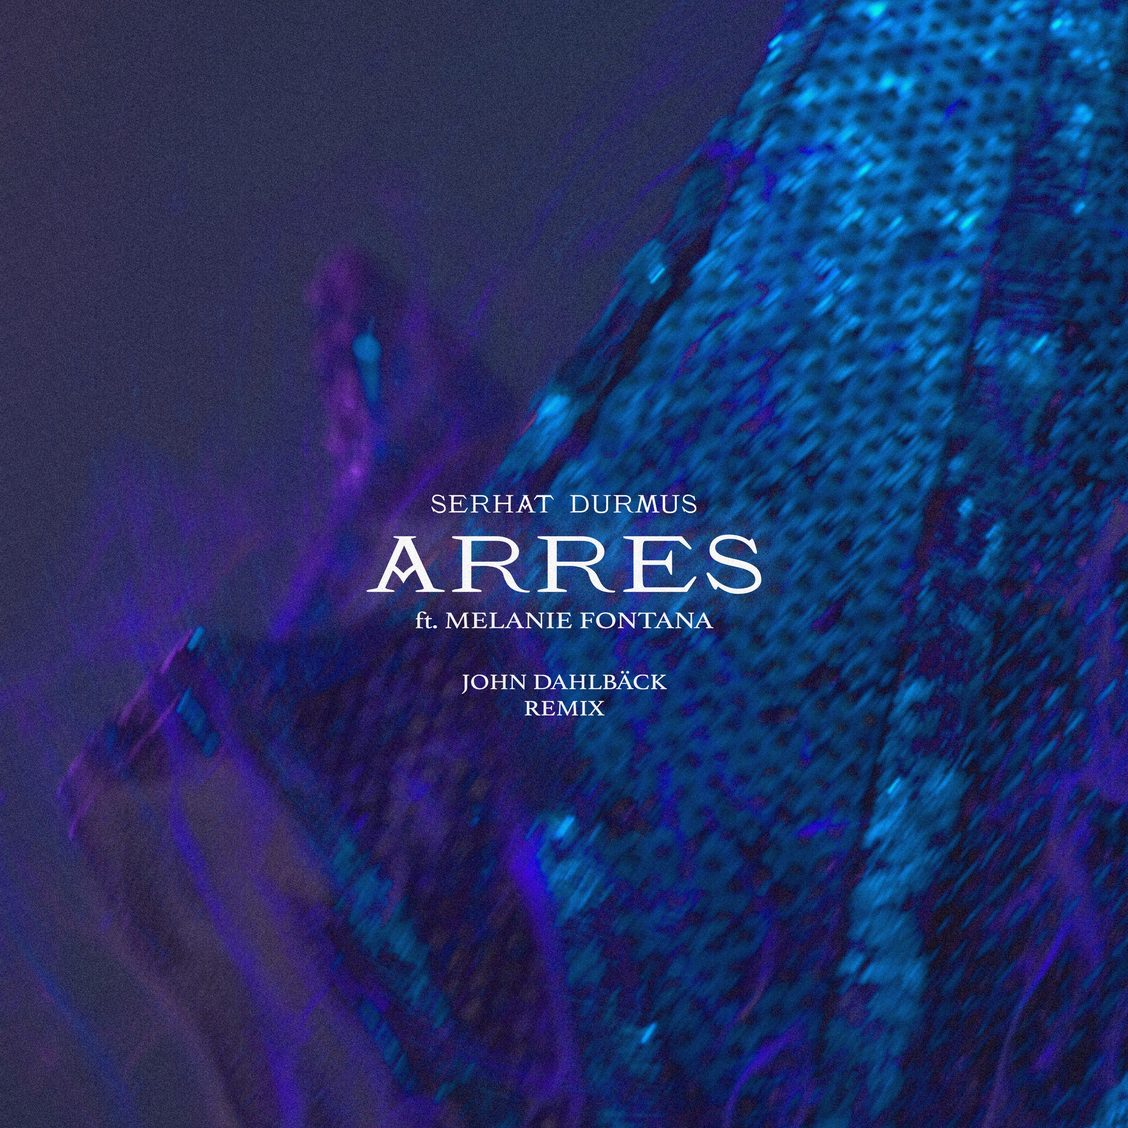 Serhat Durmus John Dahlbäck Remix Arres